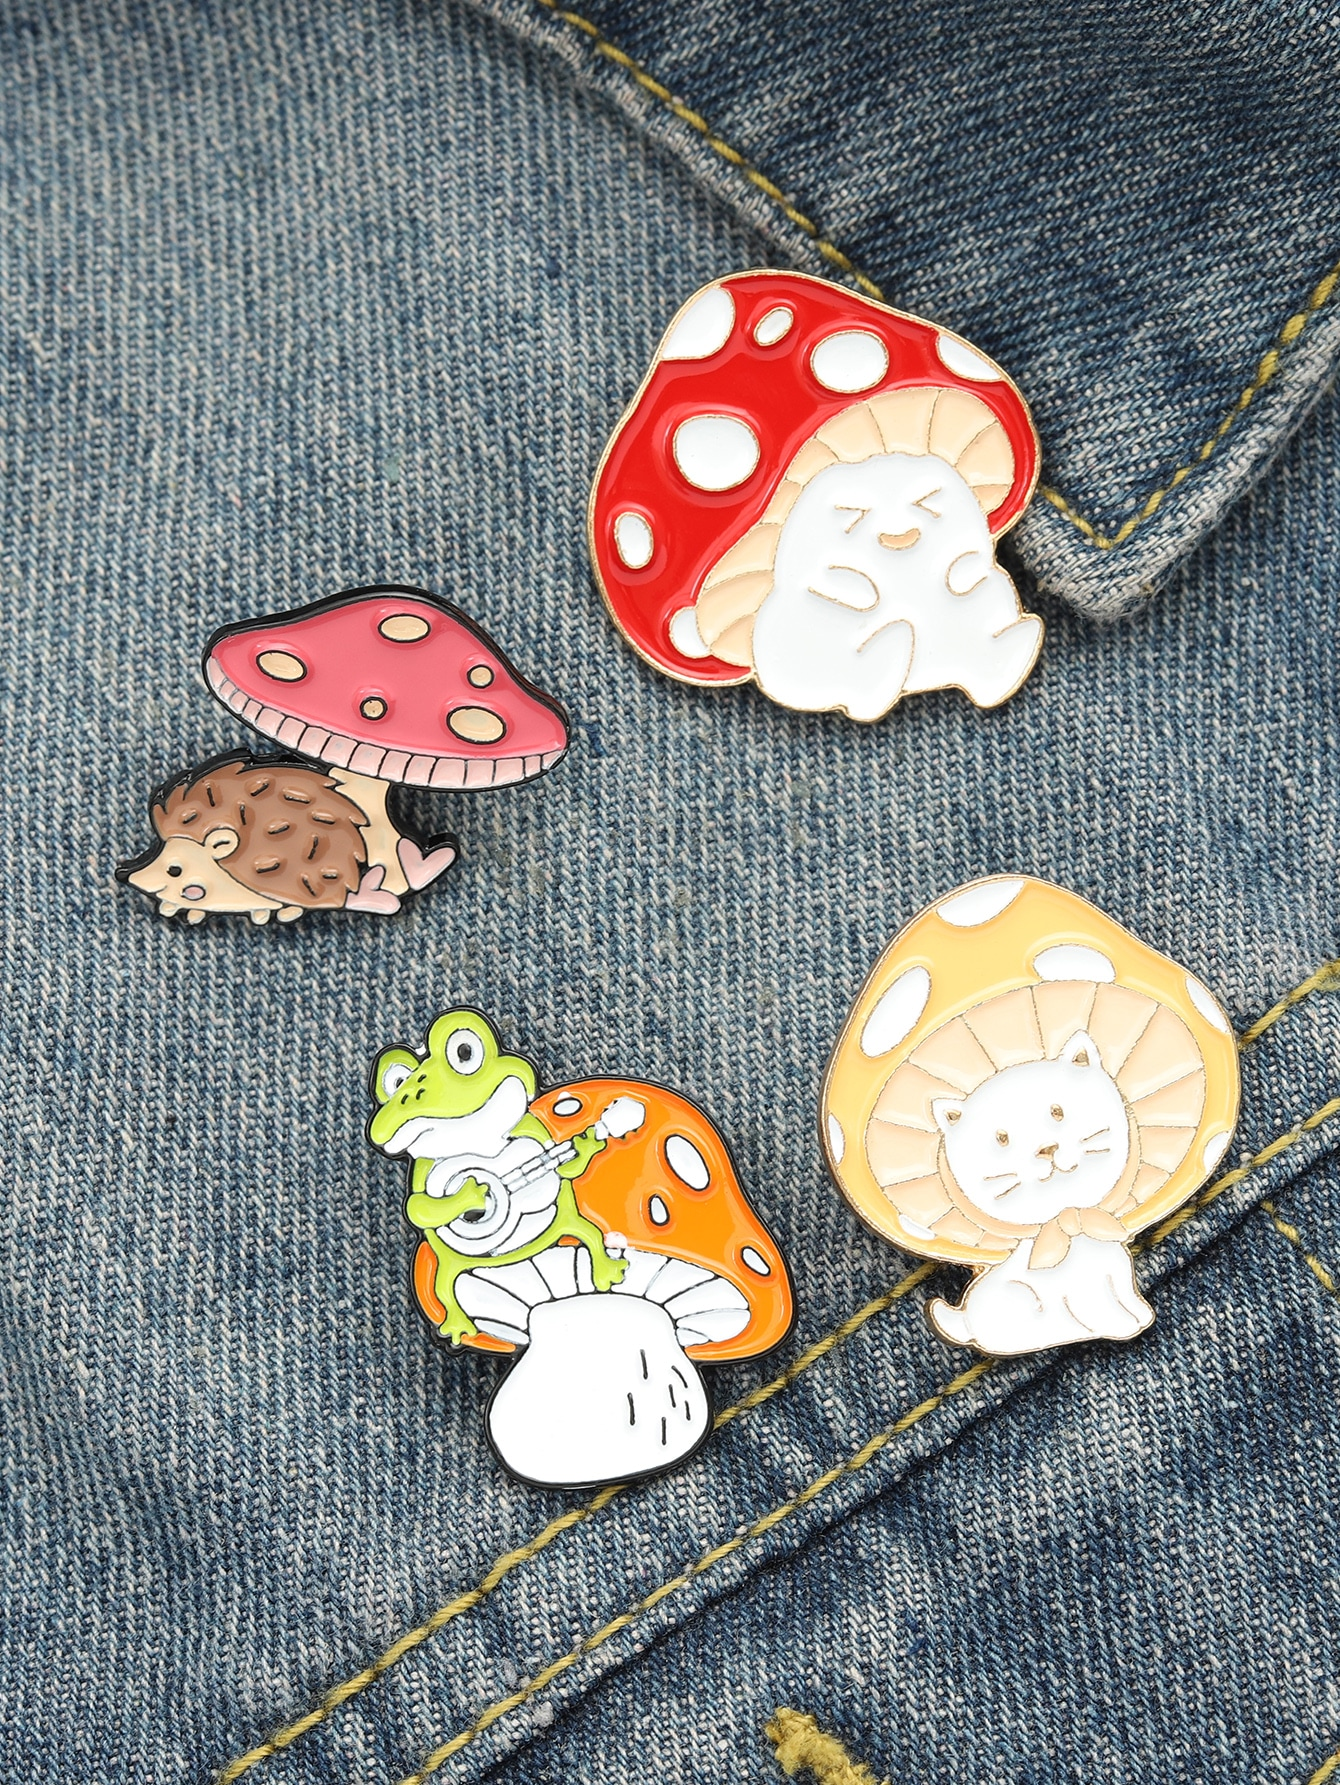 4pcs Cartoon Mushroom Design Brooch thumbnail